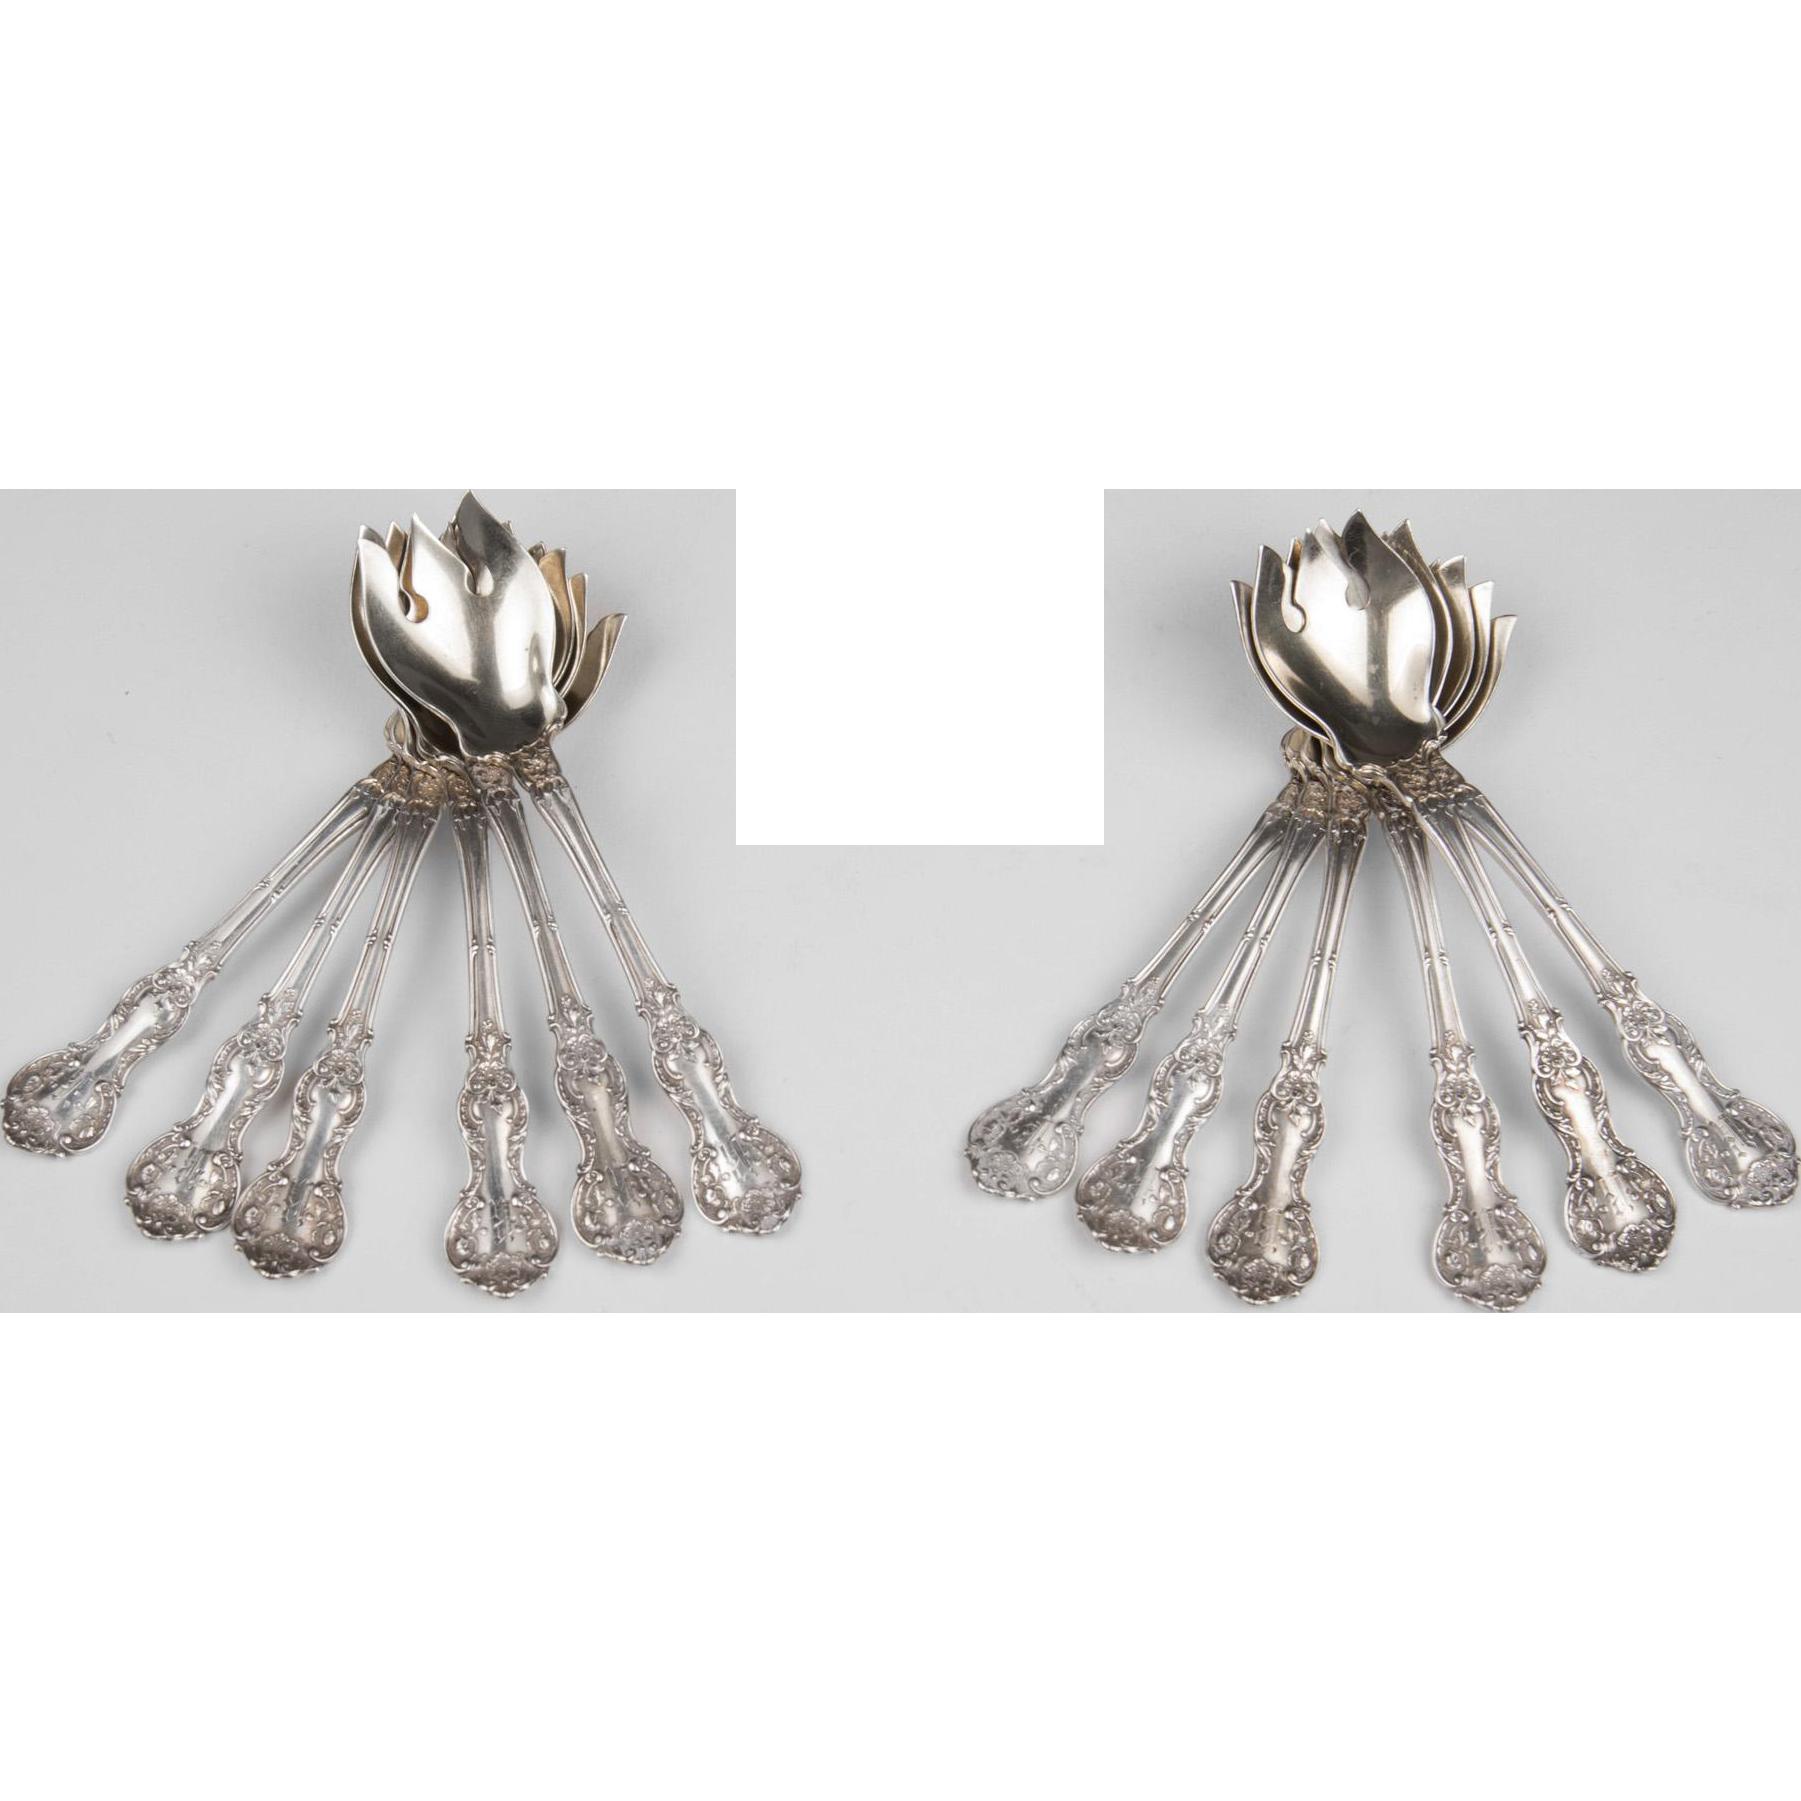 Set of 12 Gorham Fleury 1909 Sterling Silver Ice Cream Forks